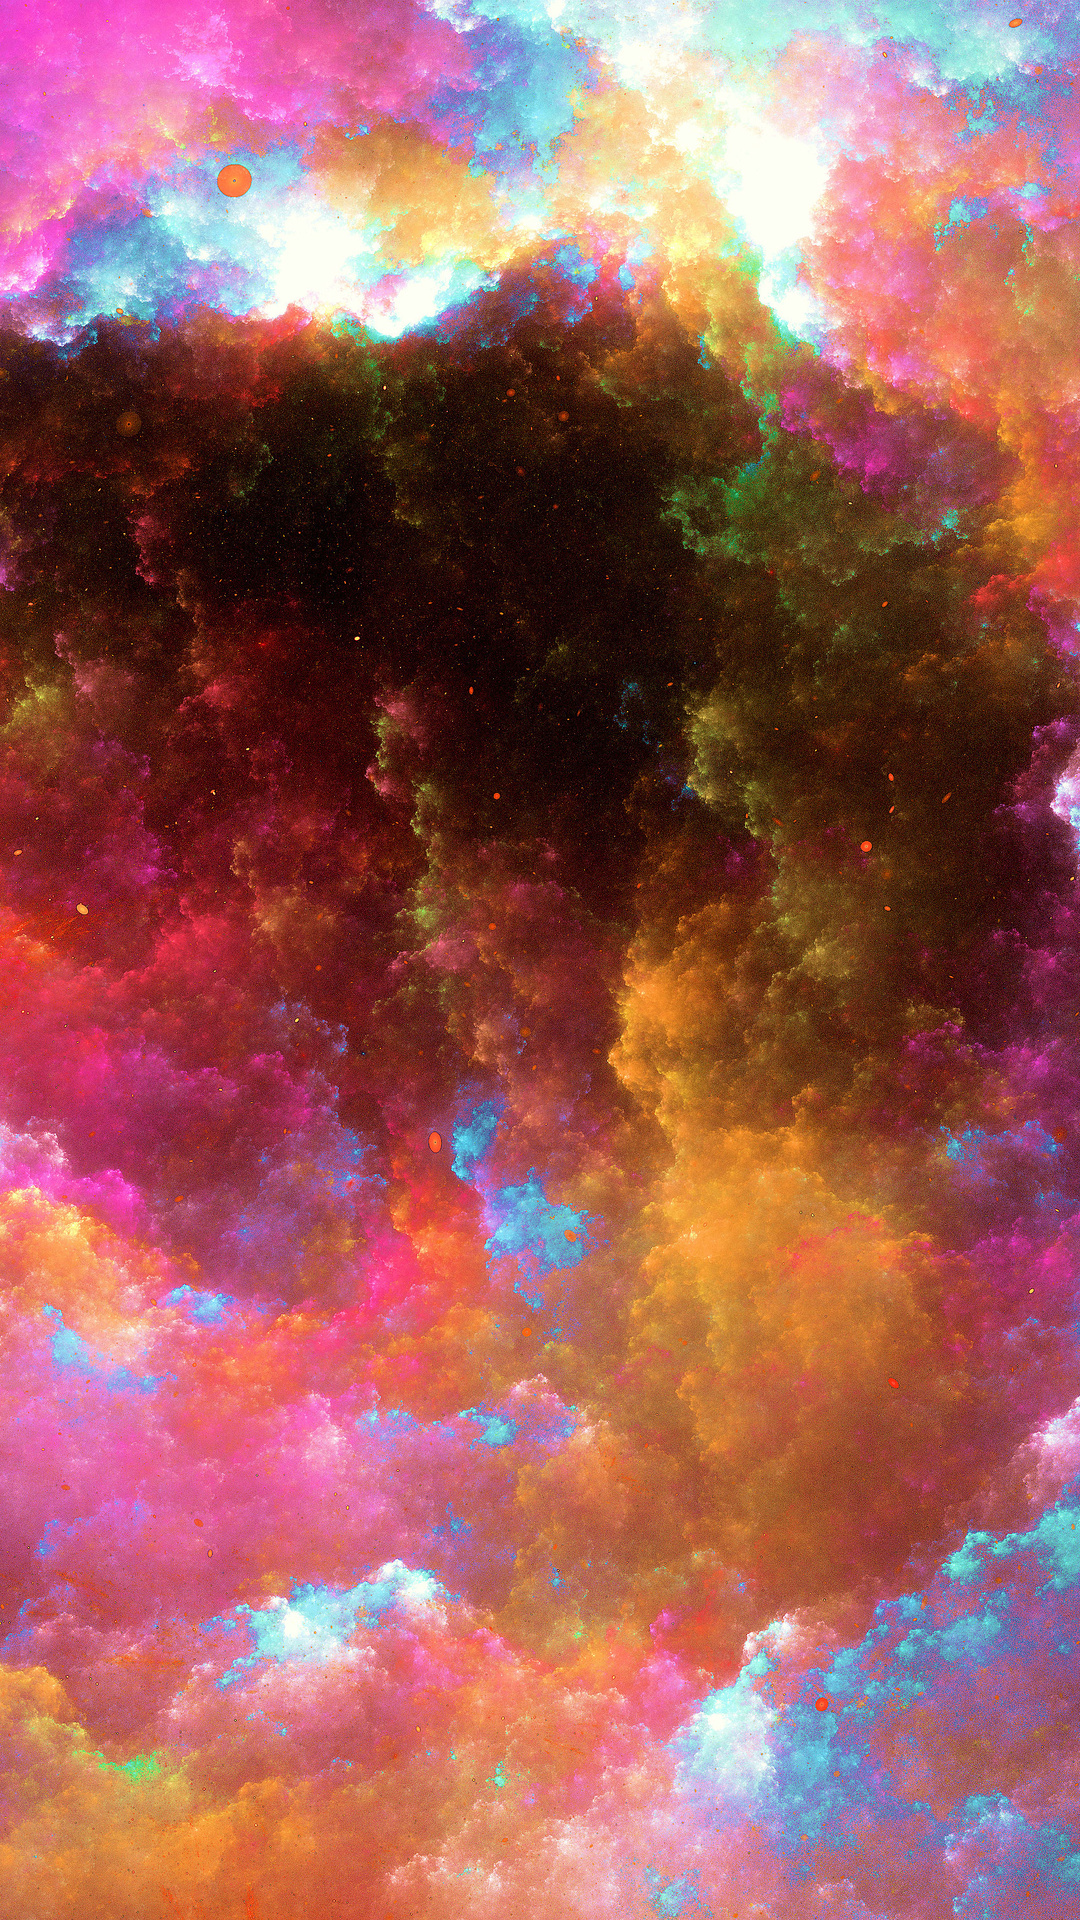 colorful-nebula-digital-art-5k-0h.jpg